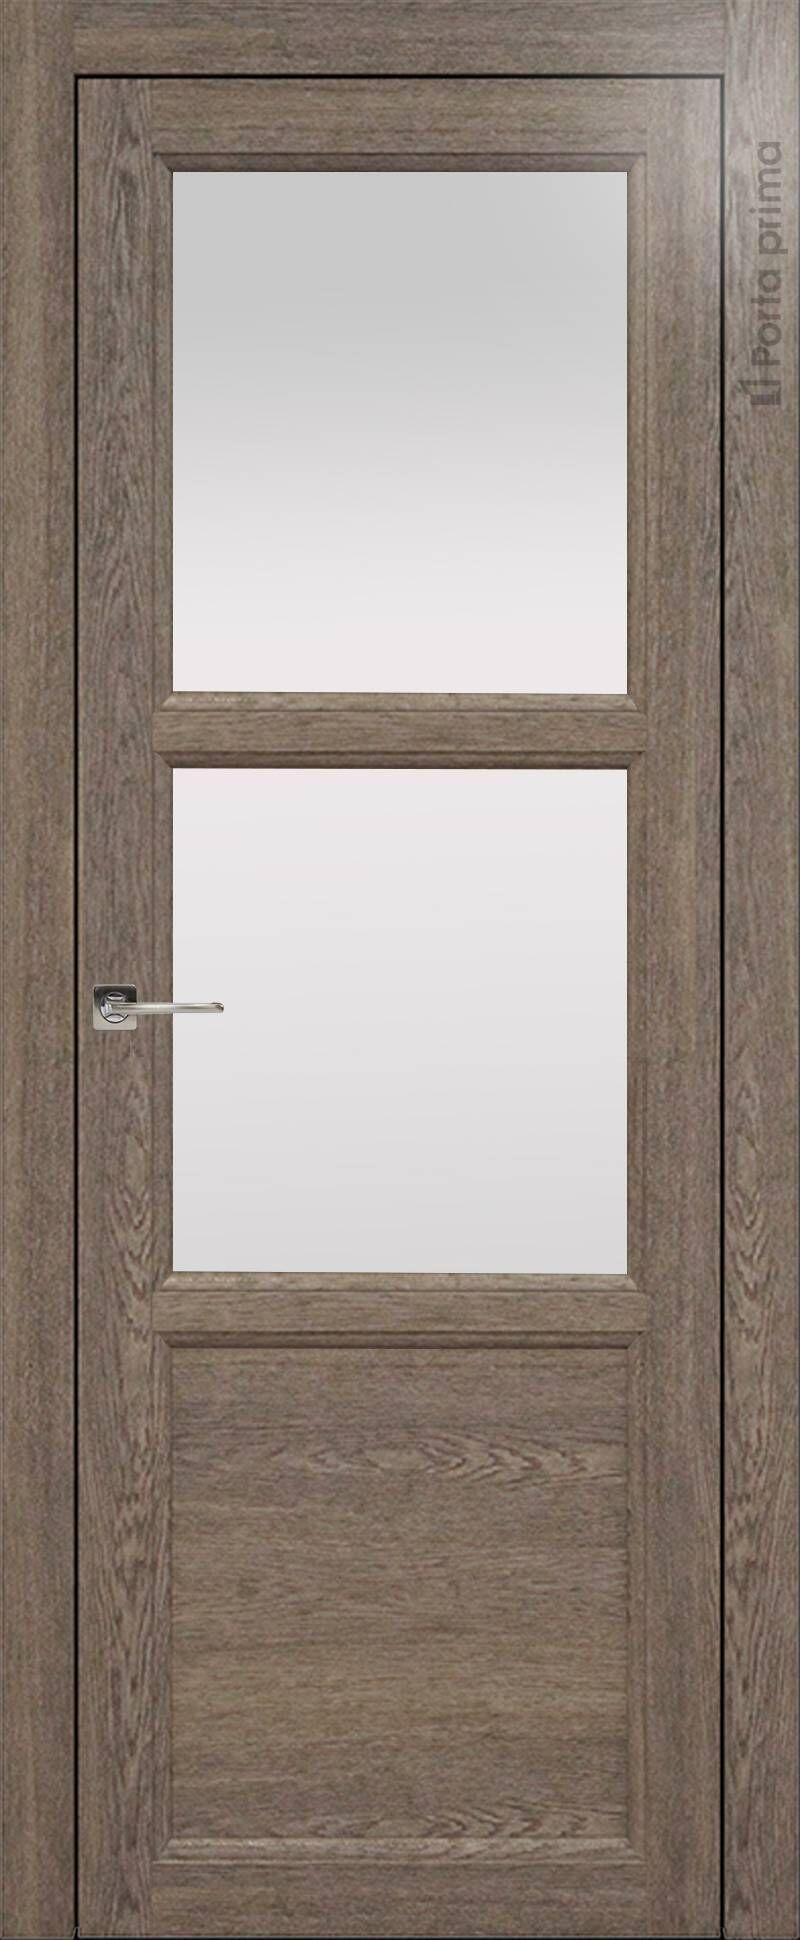 Sorrento-R Б2 цвет - Дуб антик Со стеклом (ДО)